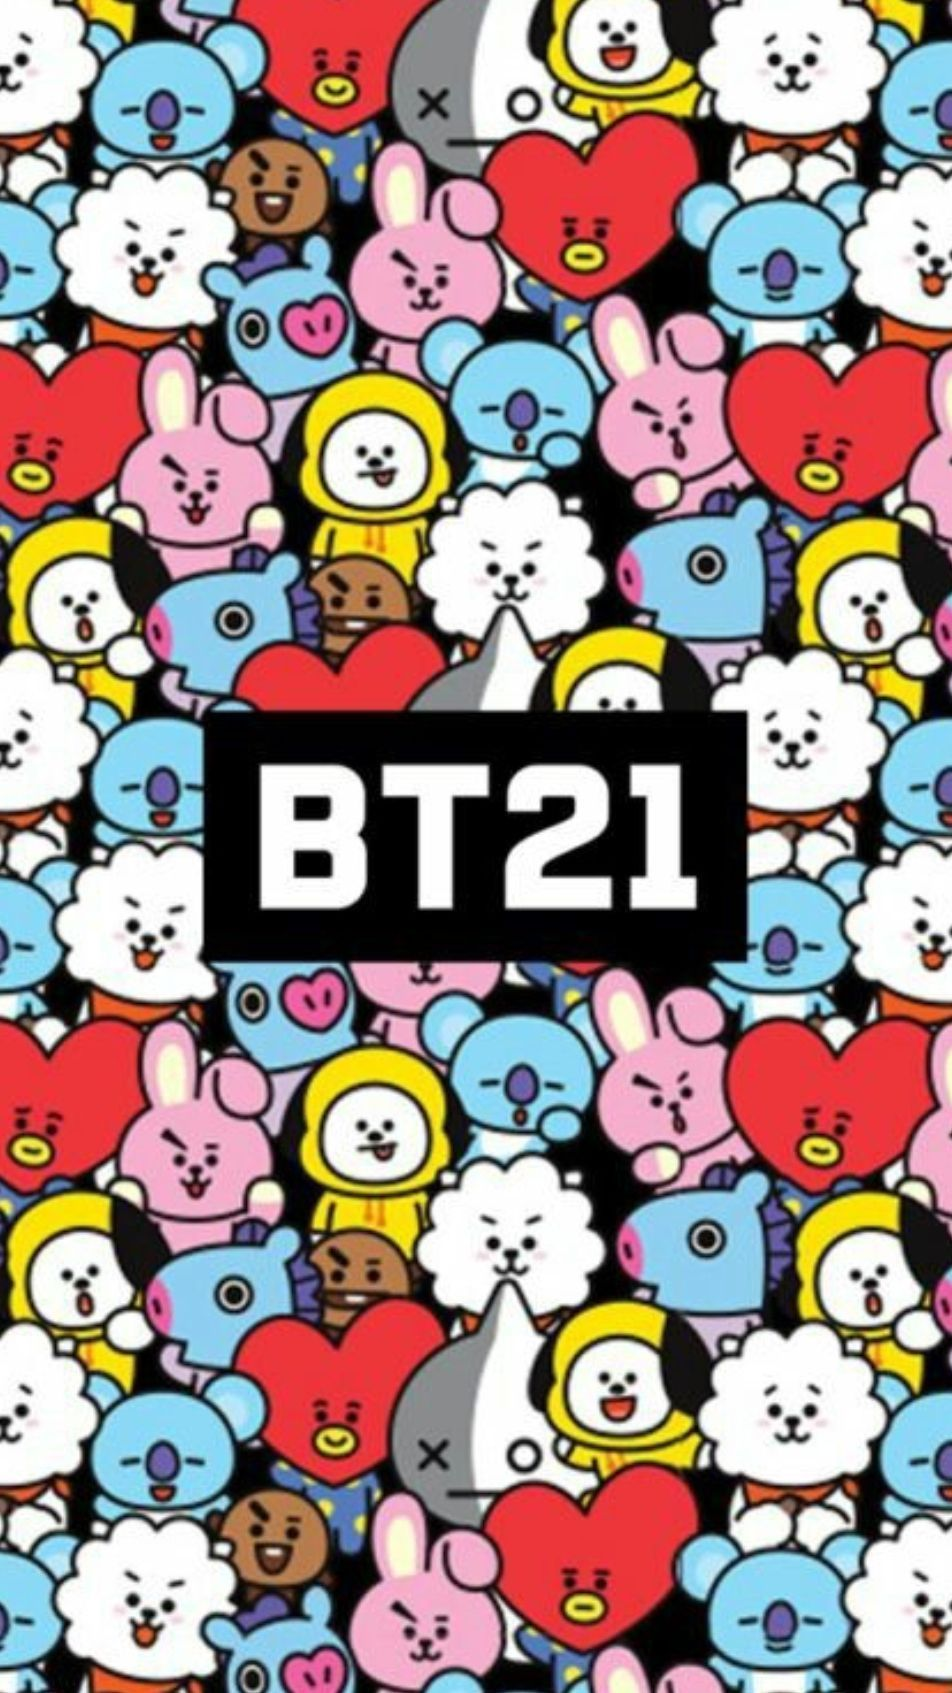 Bts wallpapers  - BT21